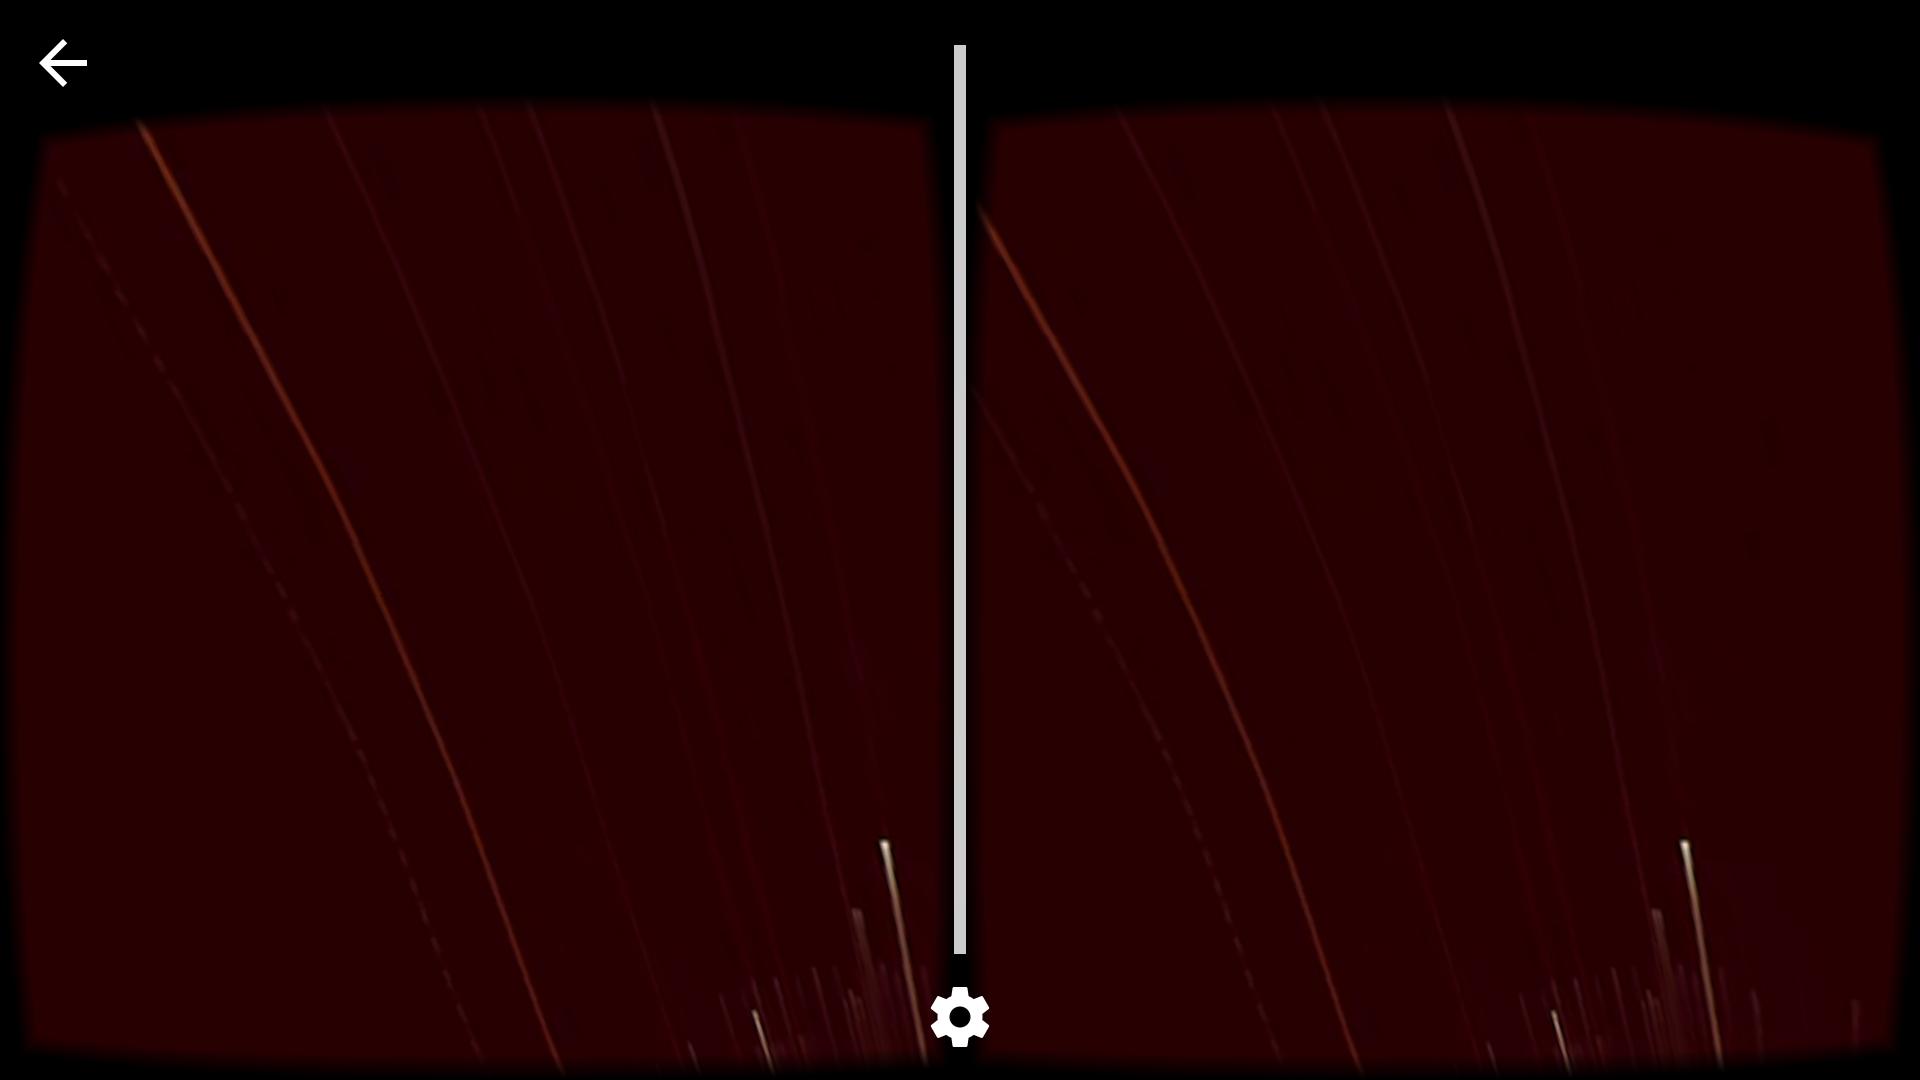 2016-12-08 14.50.46